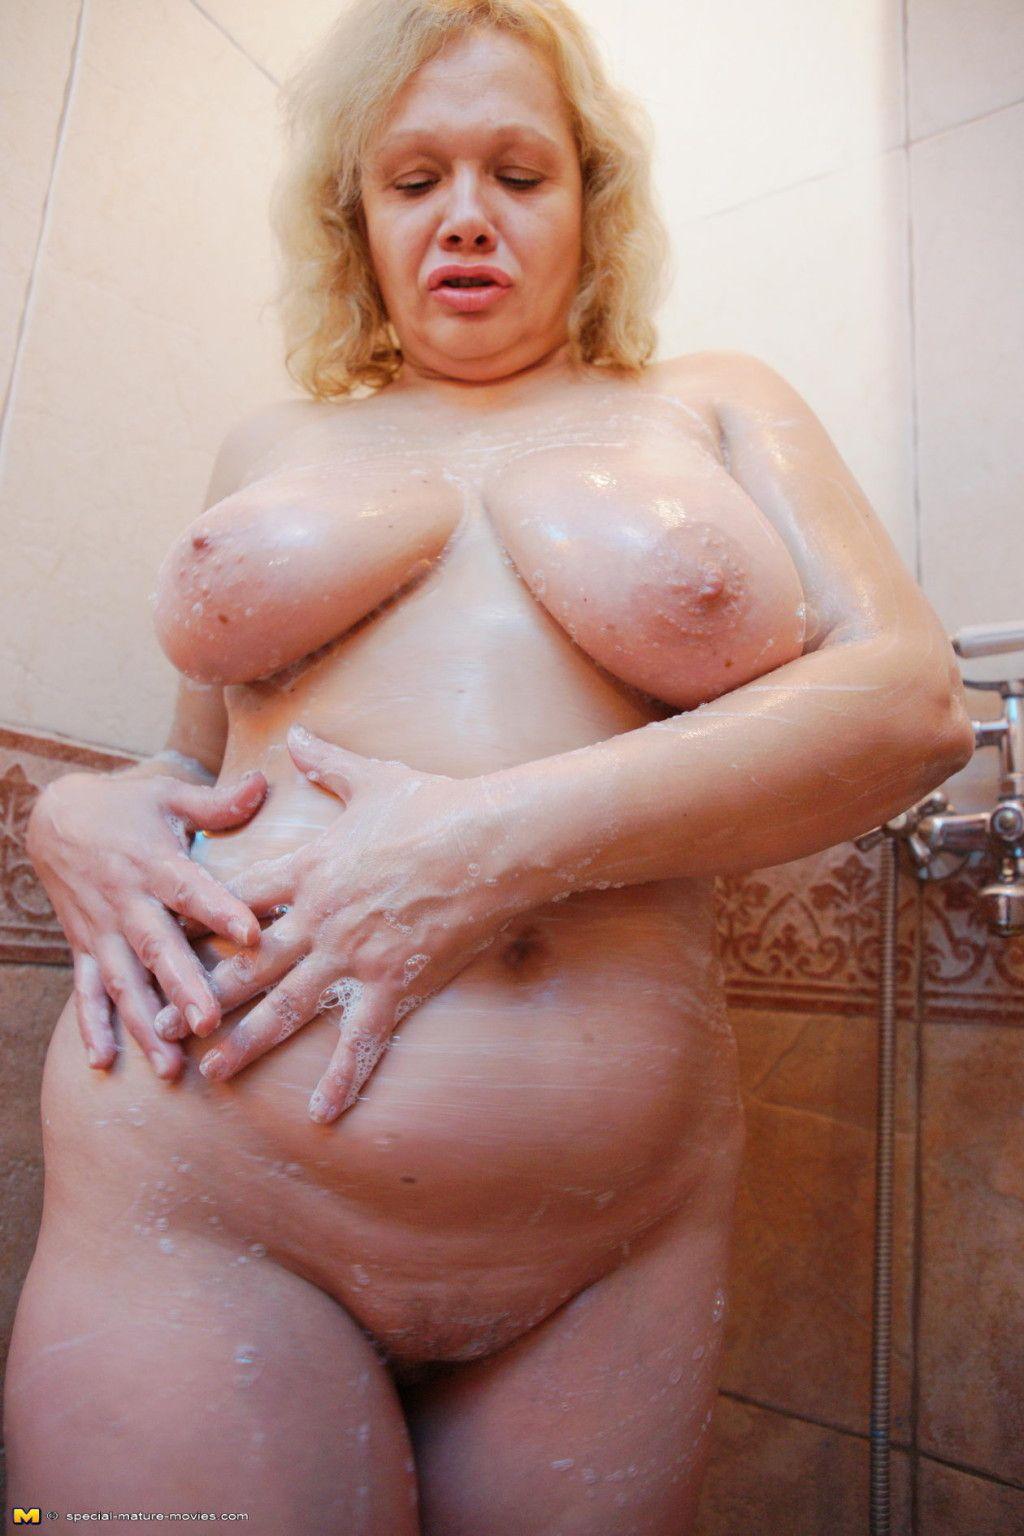 Take a look at an all female sauna